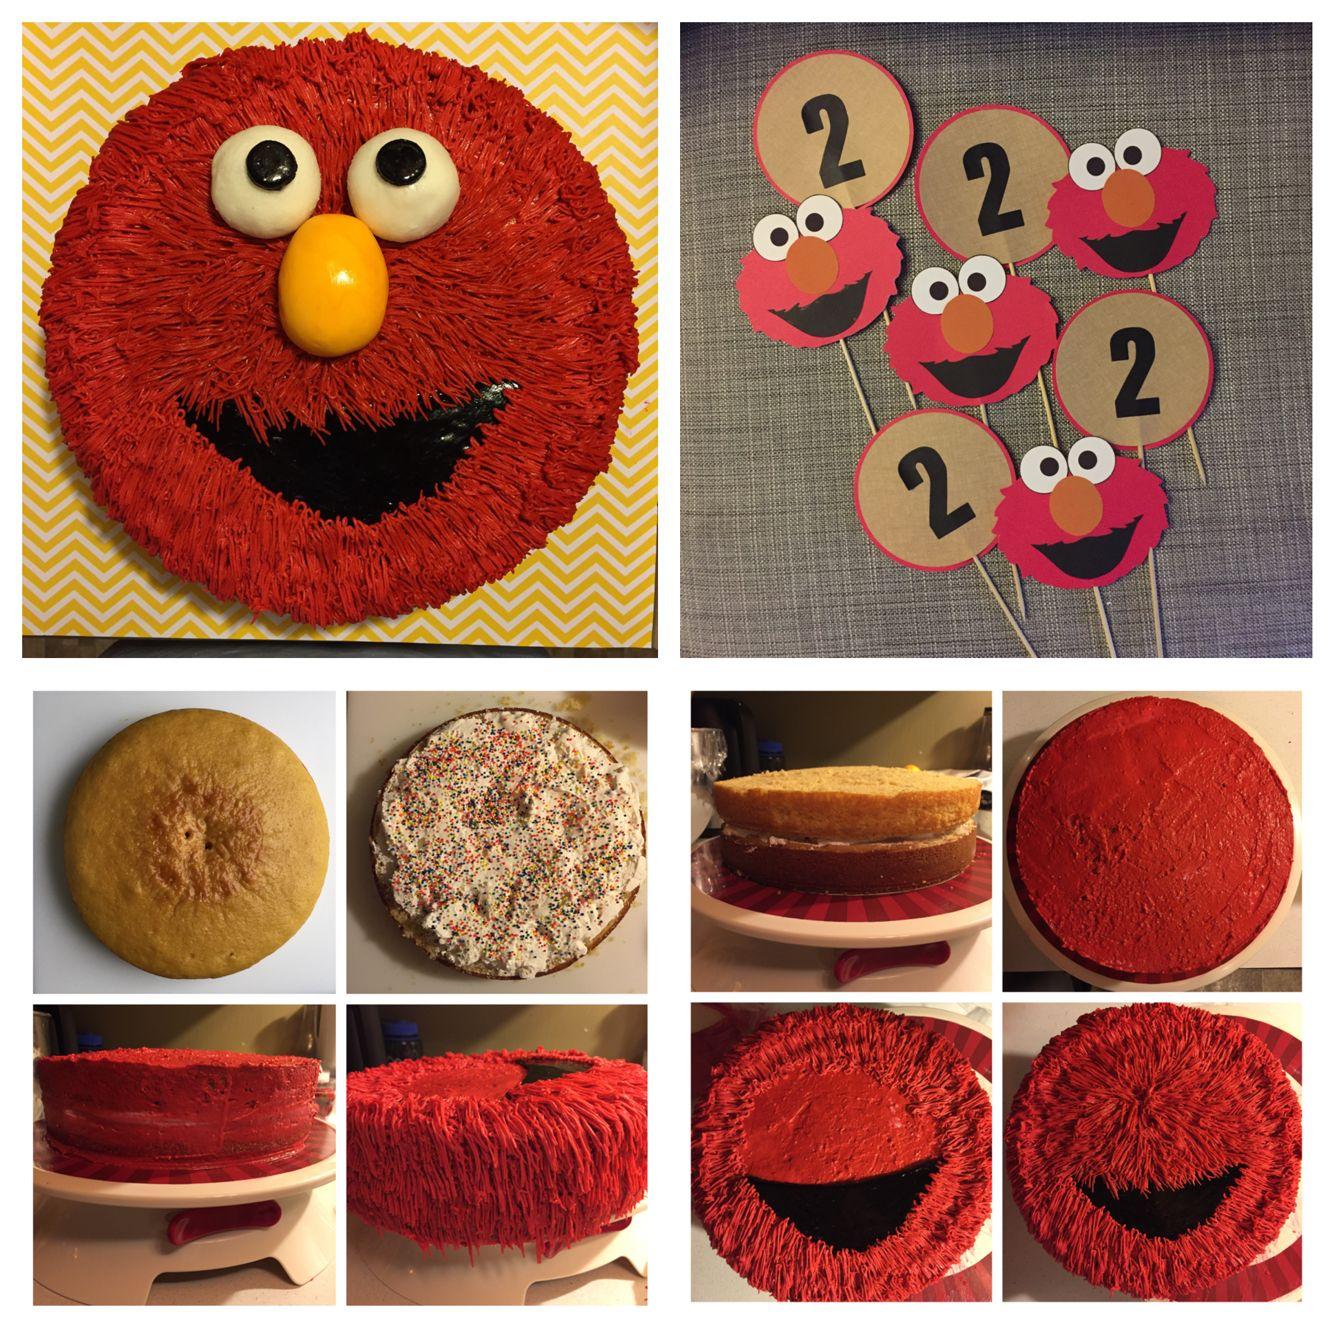 Peachy Diy Elmo Cake And Table Numbers Diy Elmo Birthday Cake Elmo Funny Birthday Cards Online Bapapcheapnameinfo